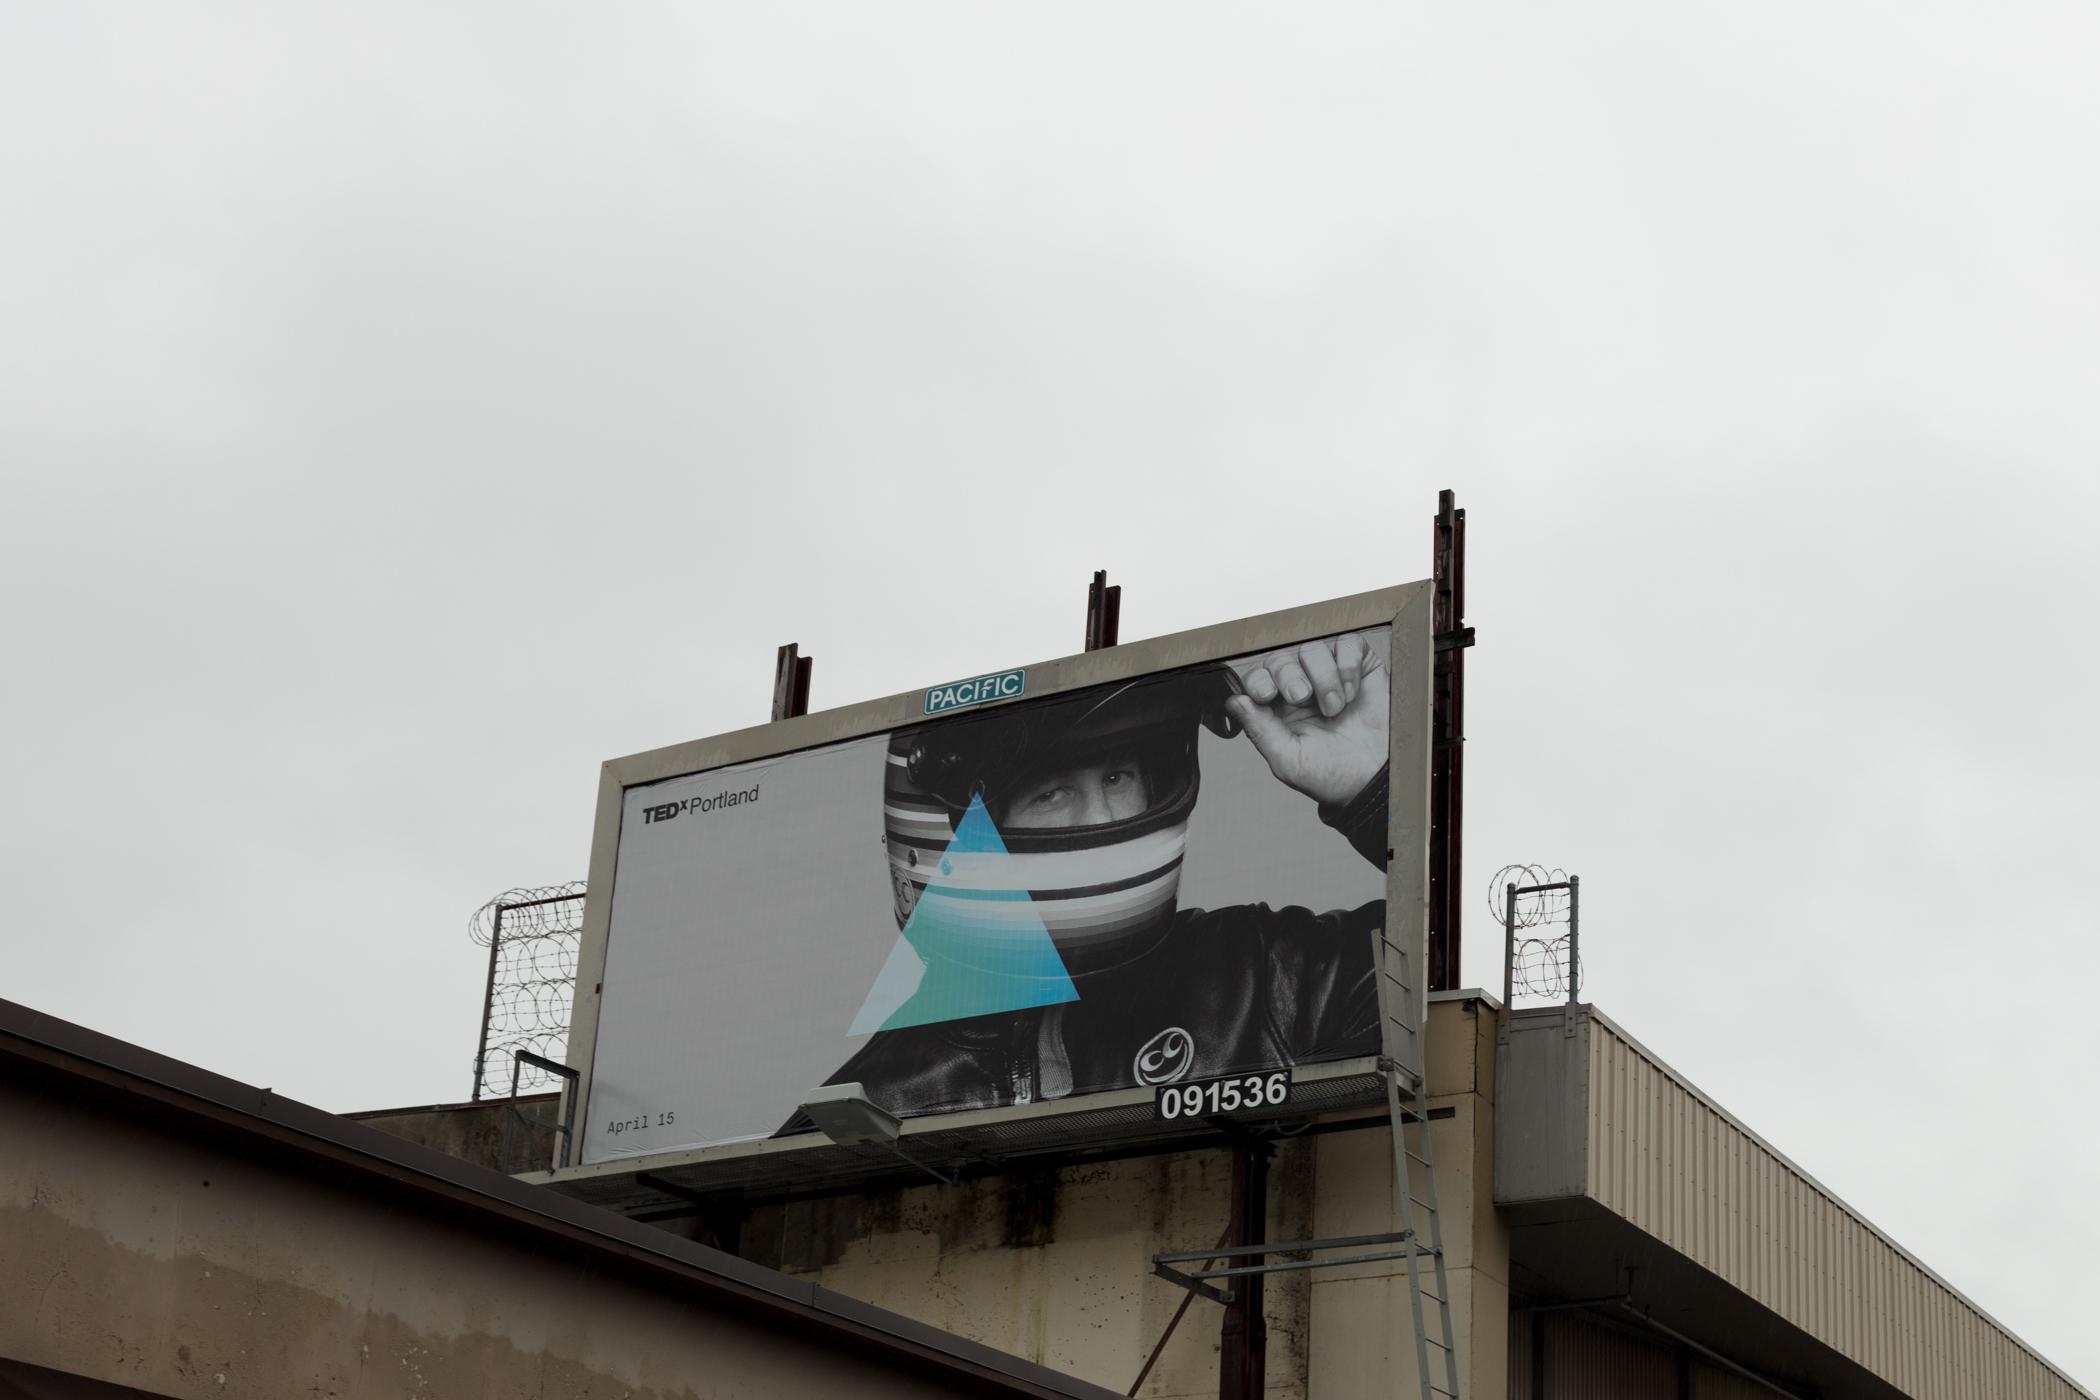 TedX_billboards-5.jpg